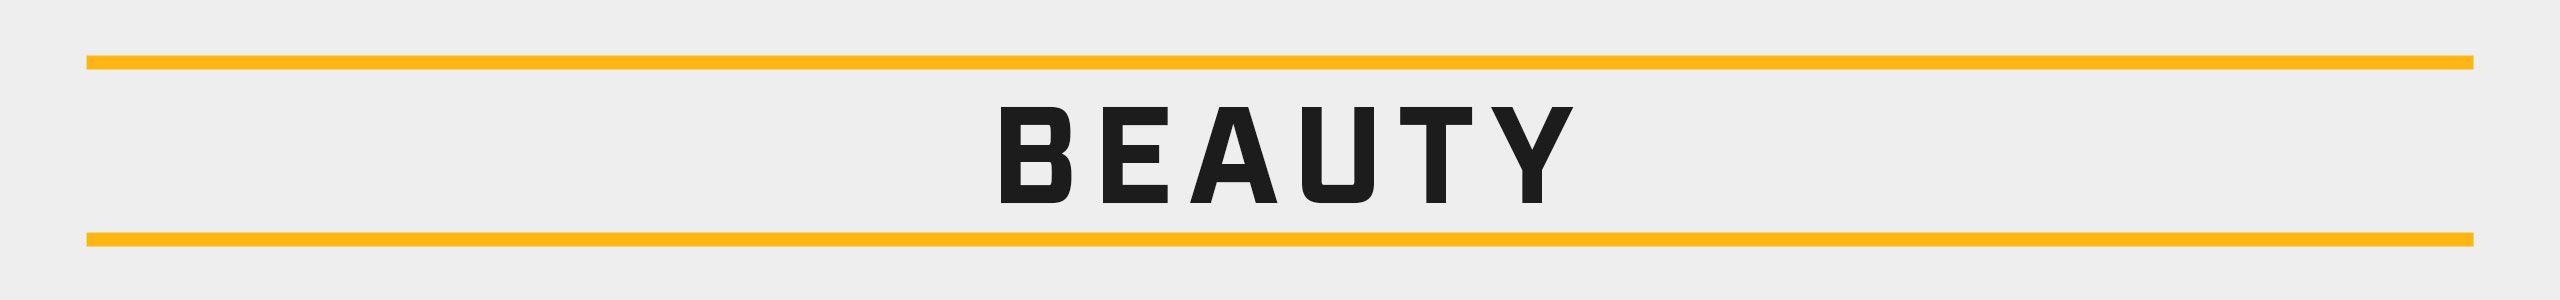 beauty-sb-header